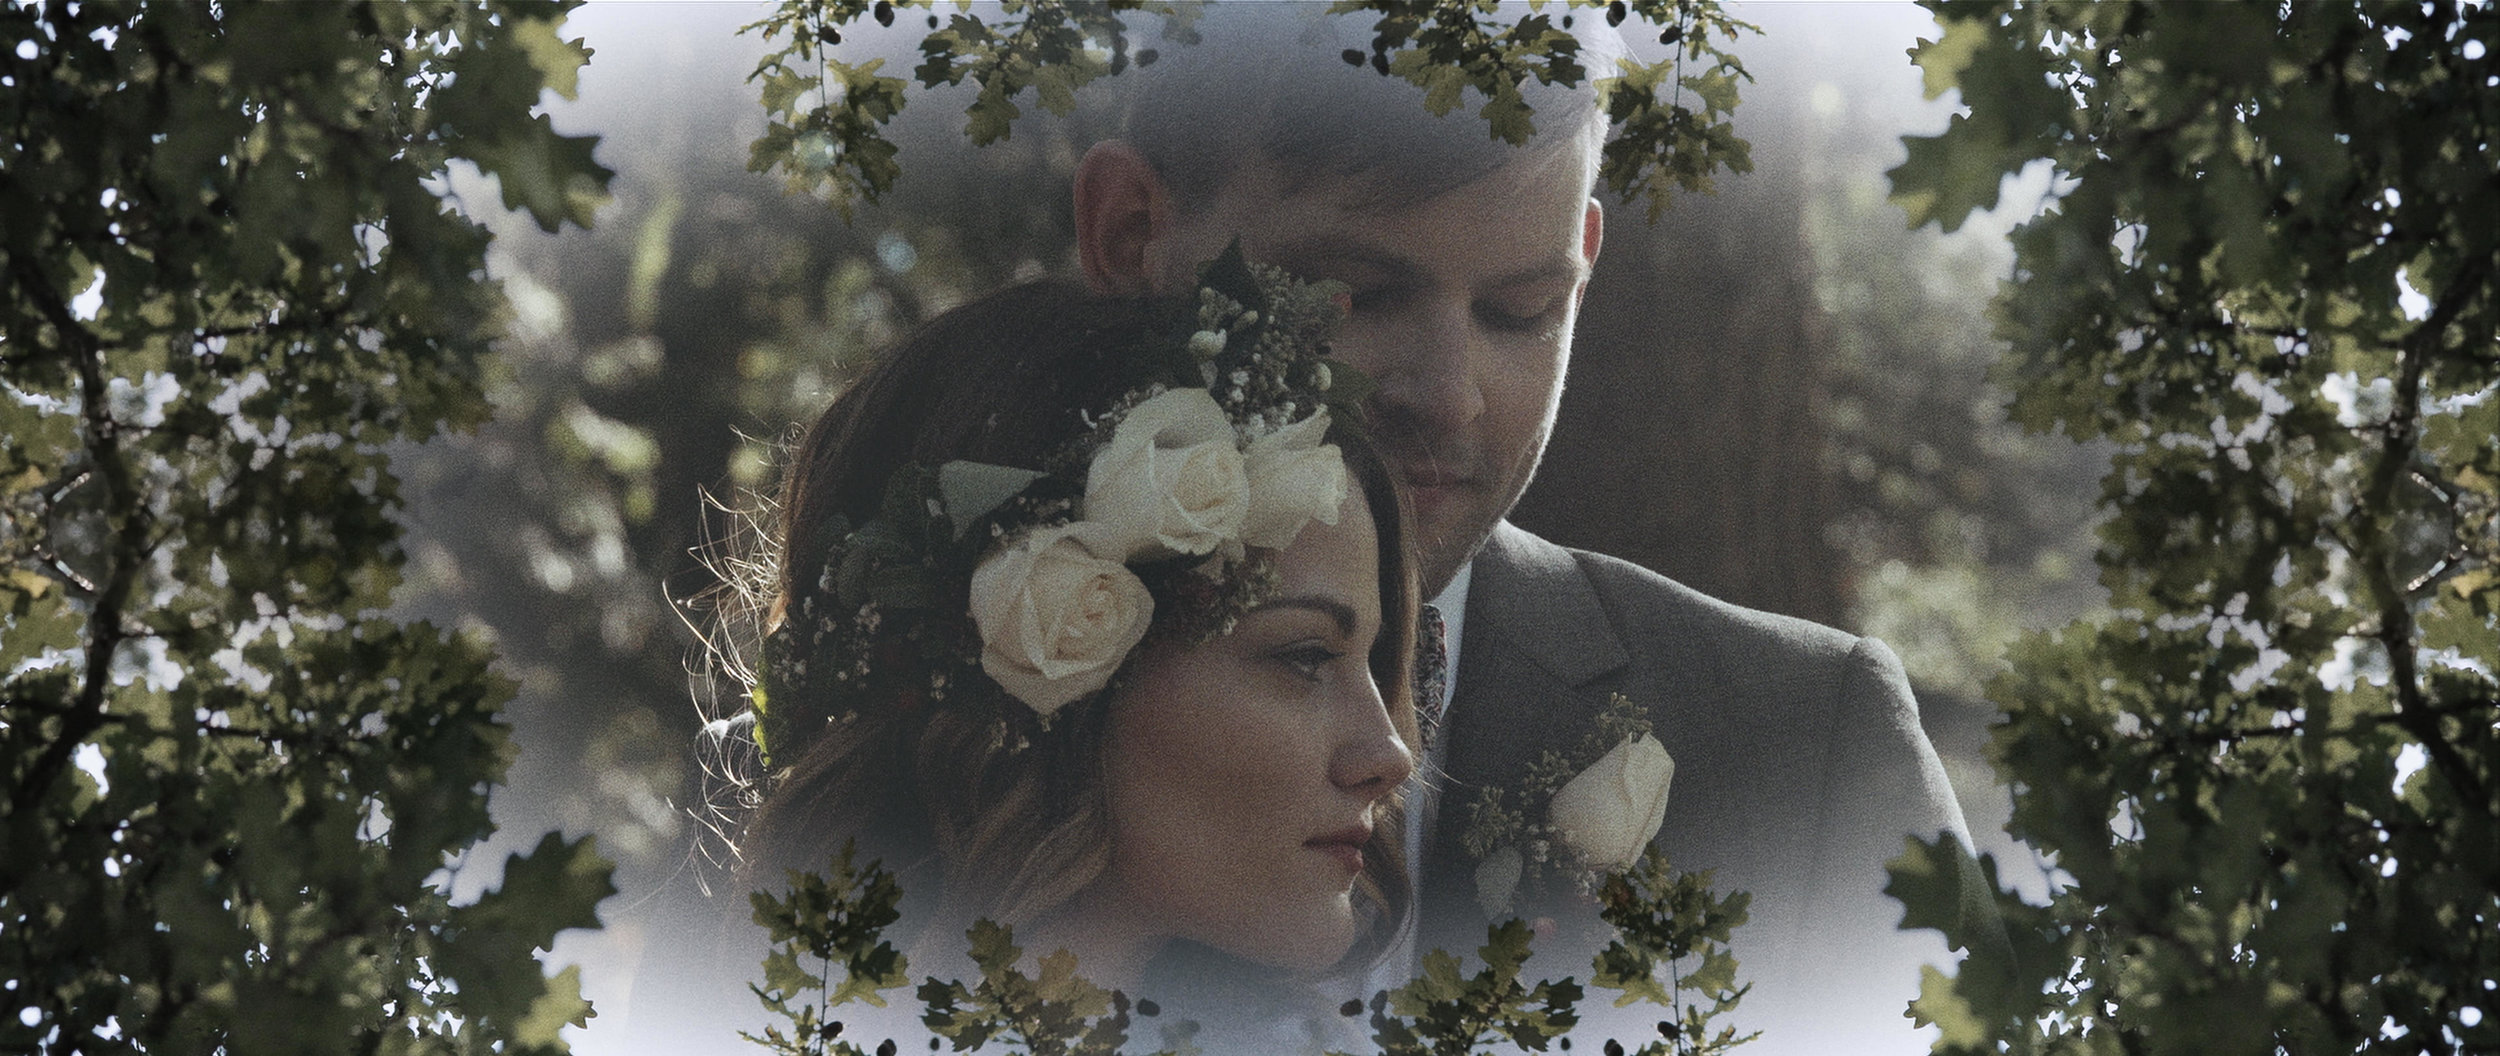 vancouver-wedding-videography202.jpg